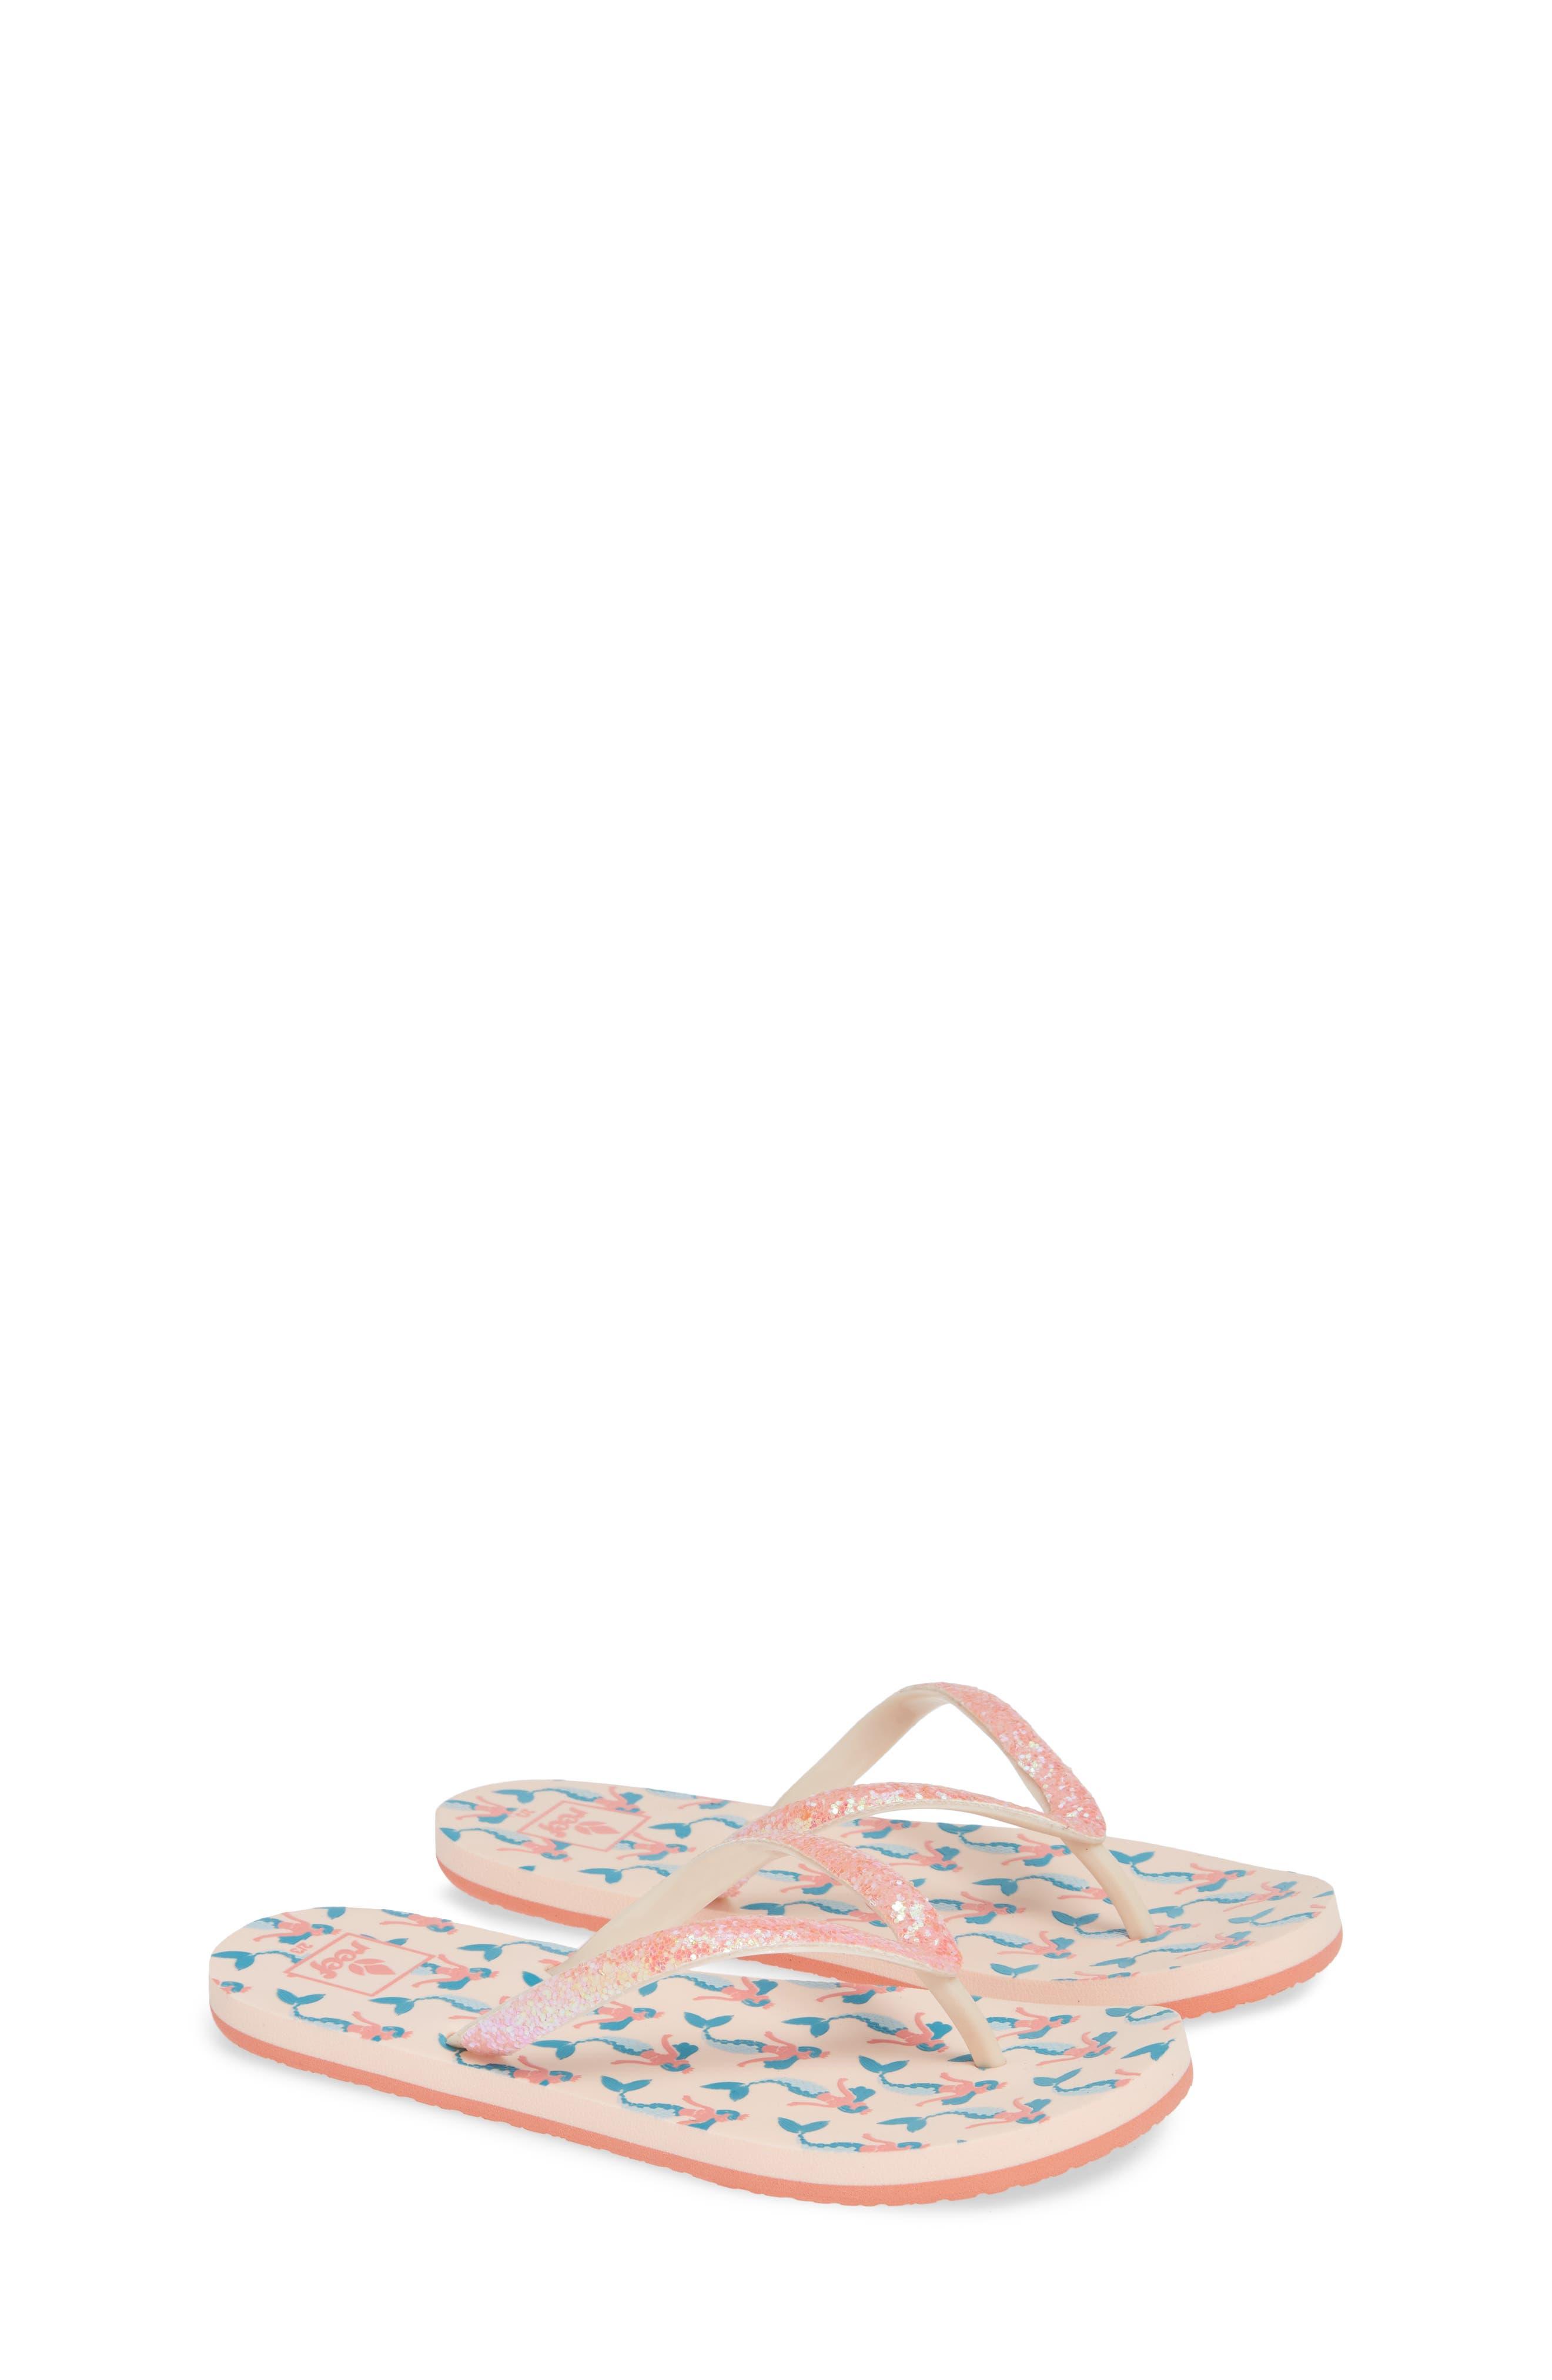 Little Stargazer Print Flip Flop,                             Alternate thumbnail 2, color,                             PINK